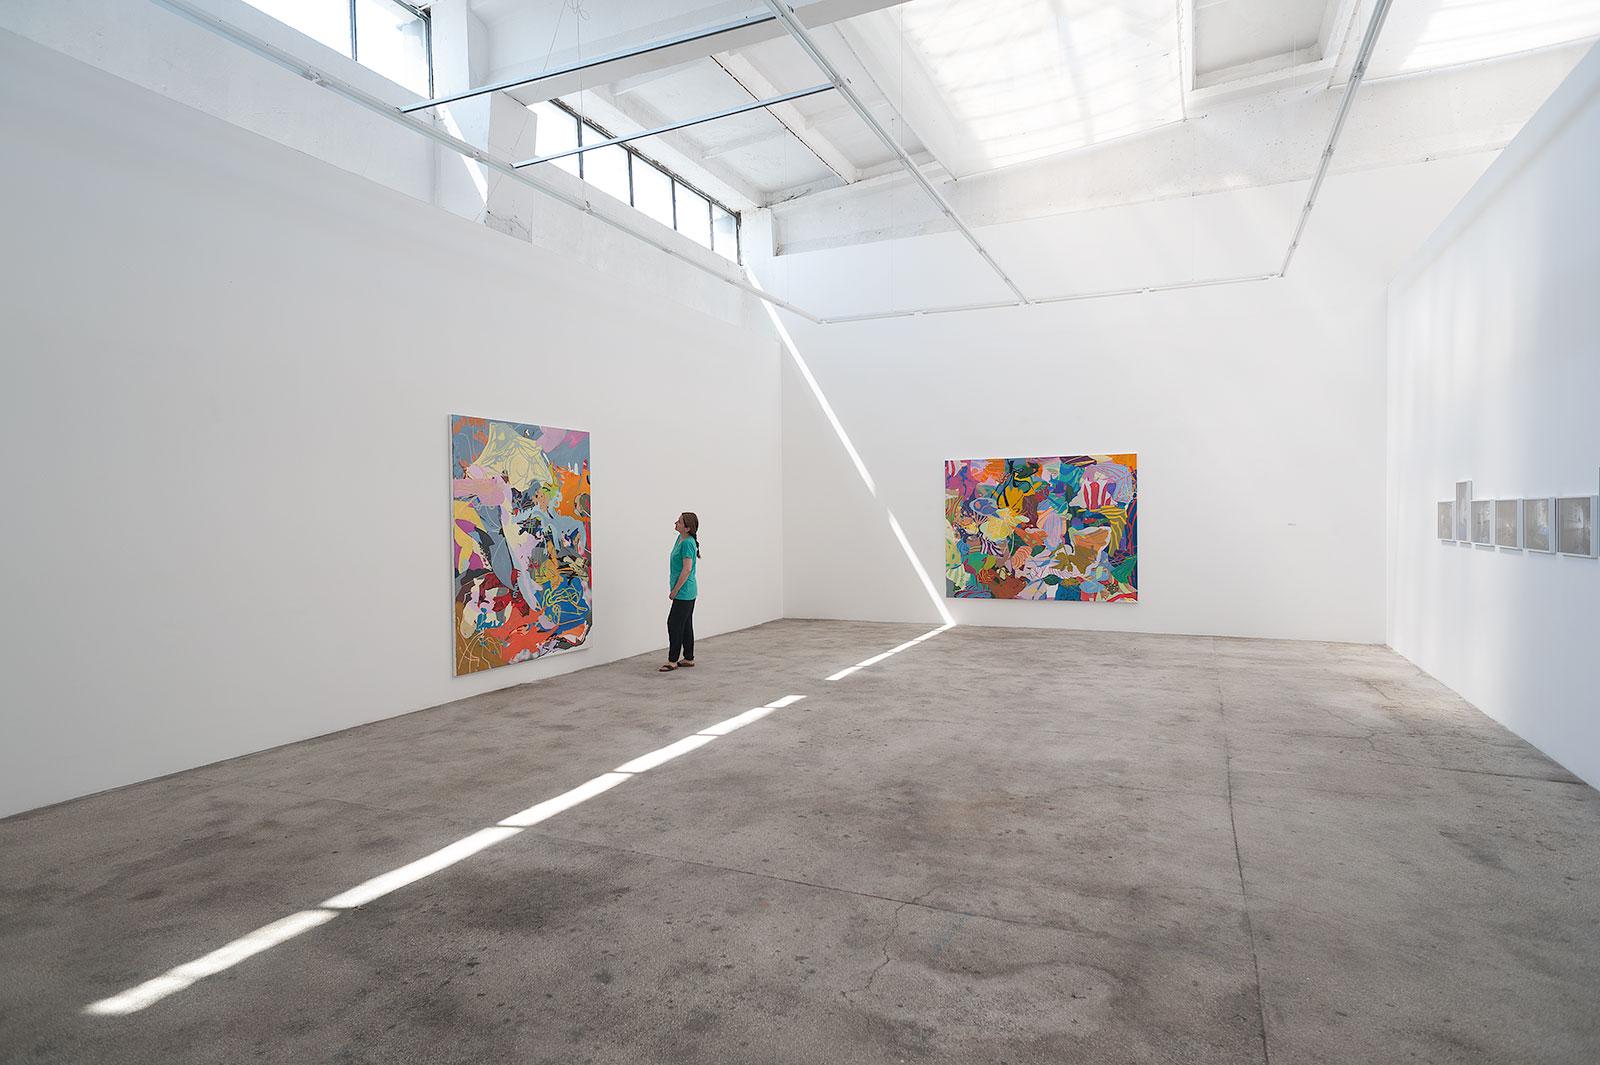 Kolonie Wedding | Berlin Contemporary Art in Romania